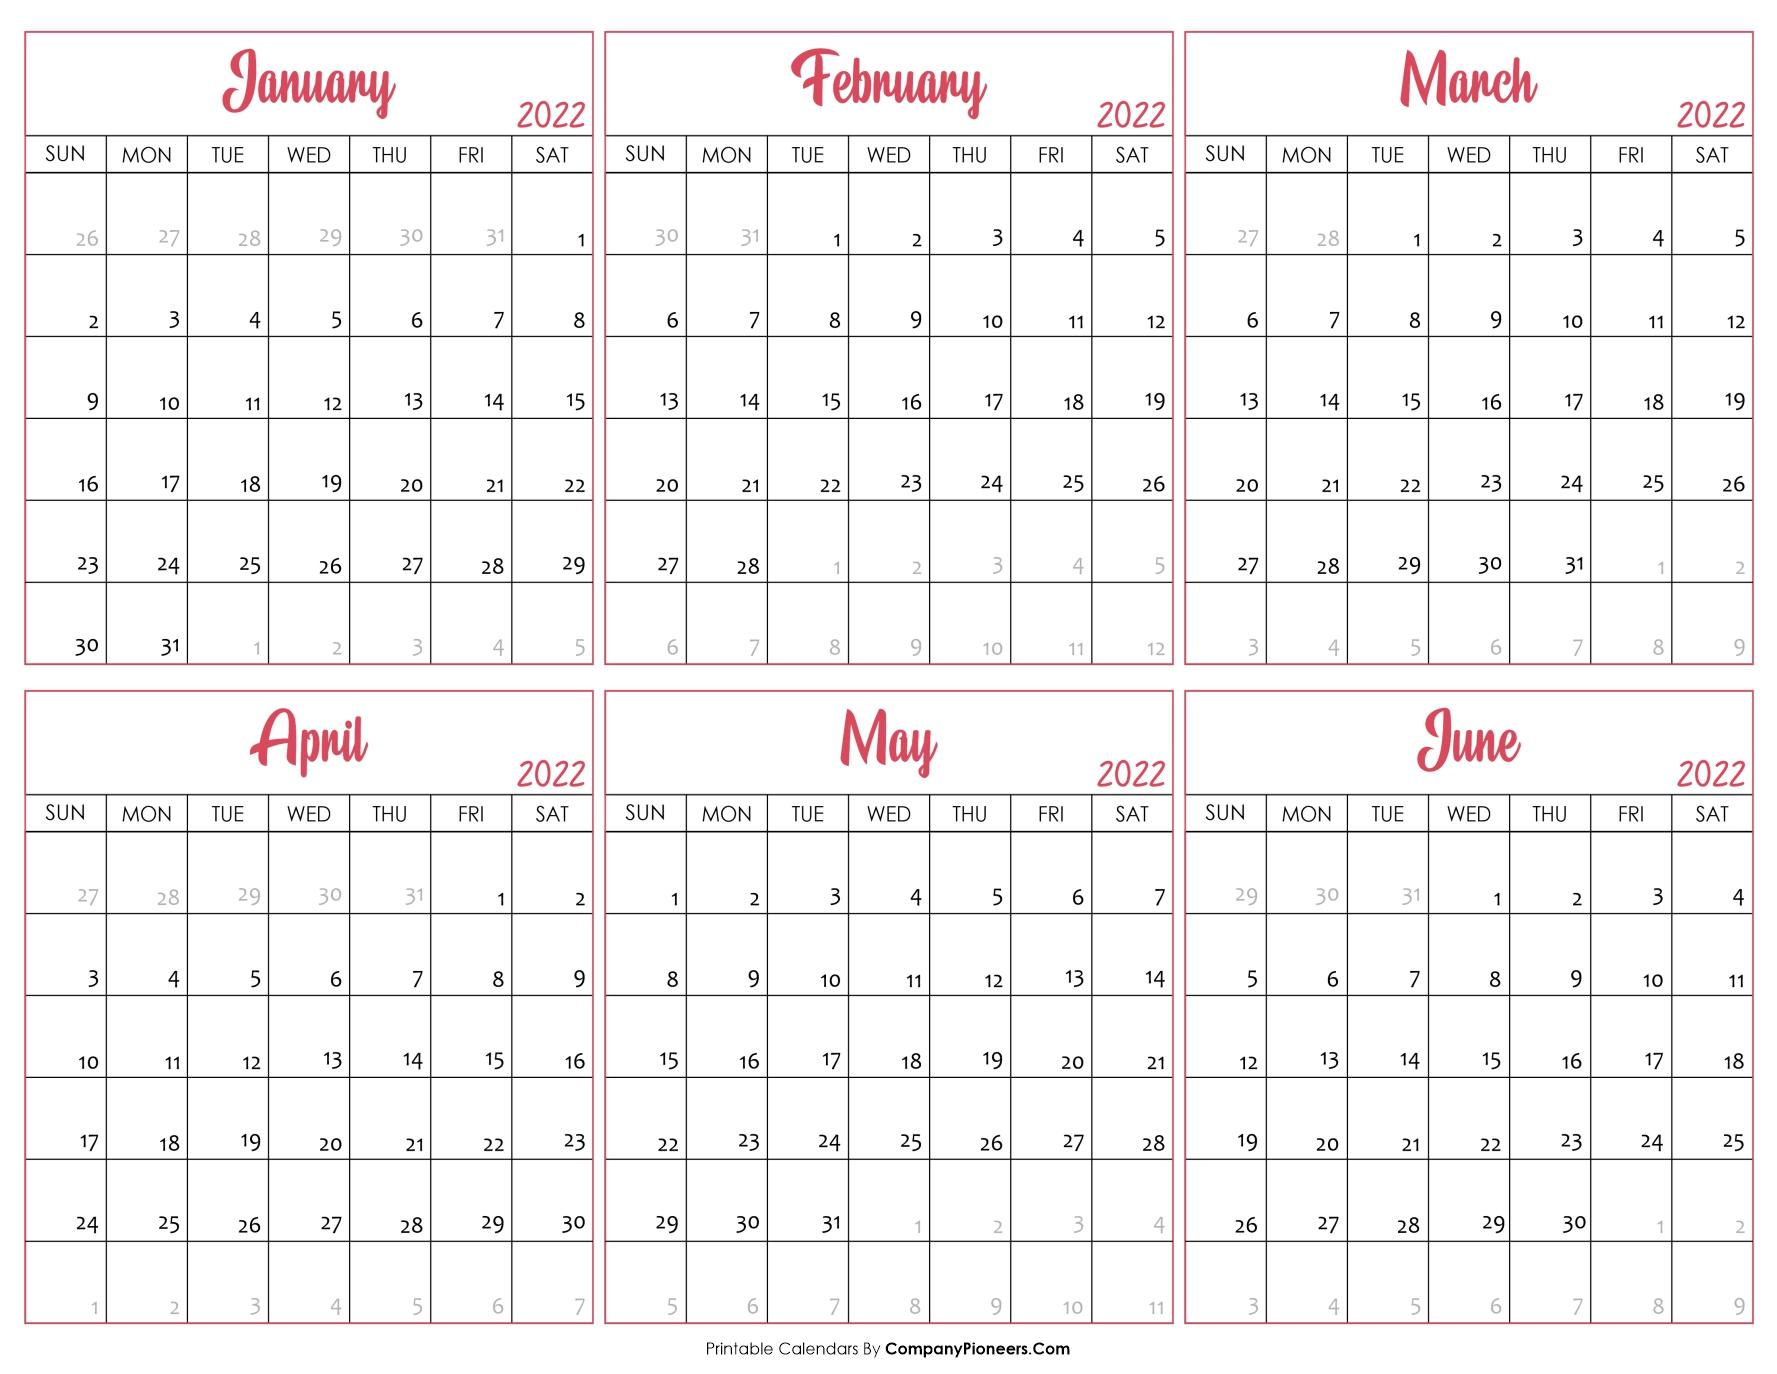 Calendar January 2022 to June 2022